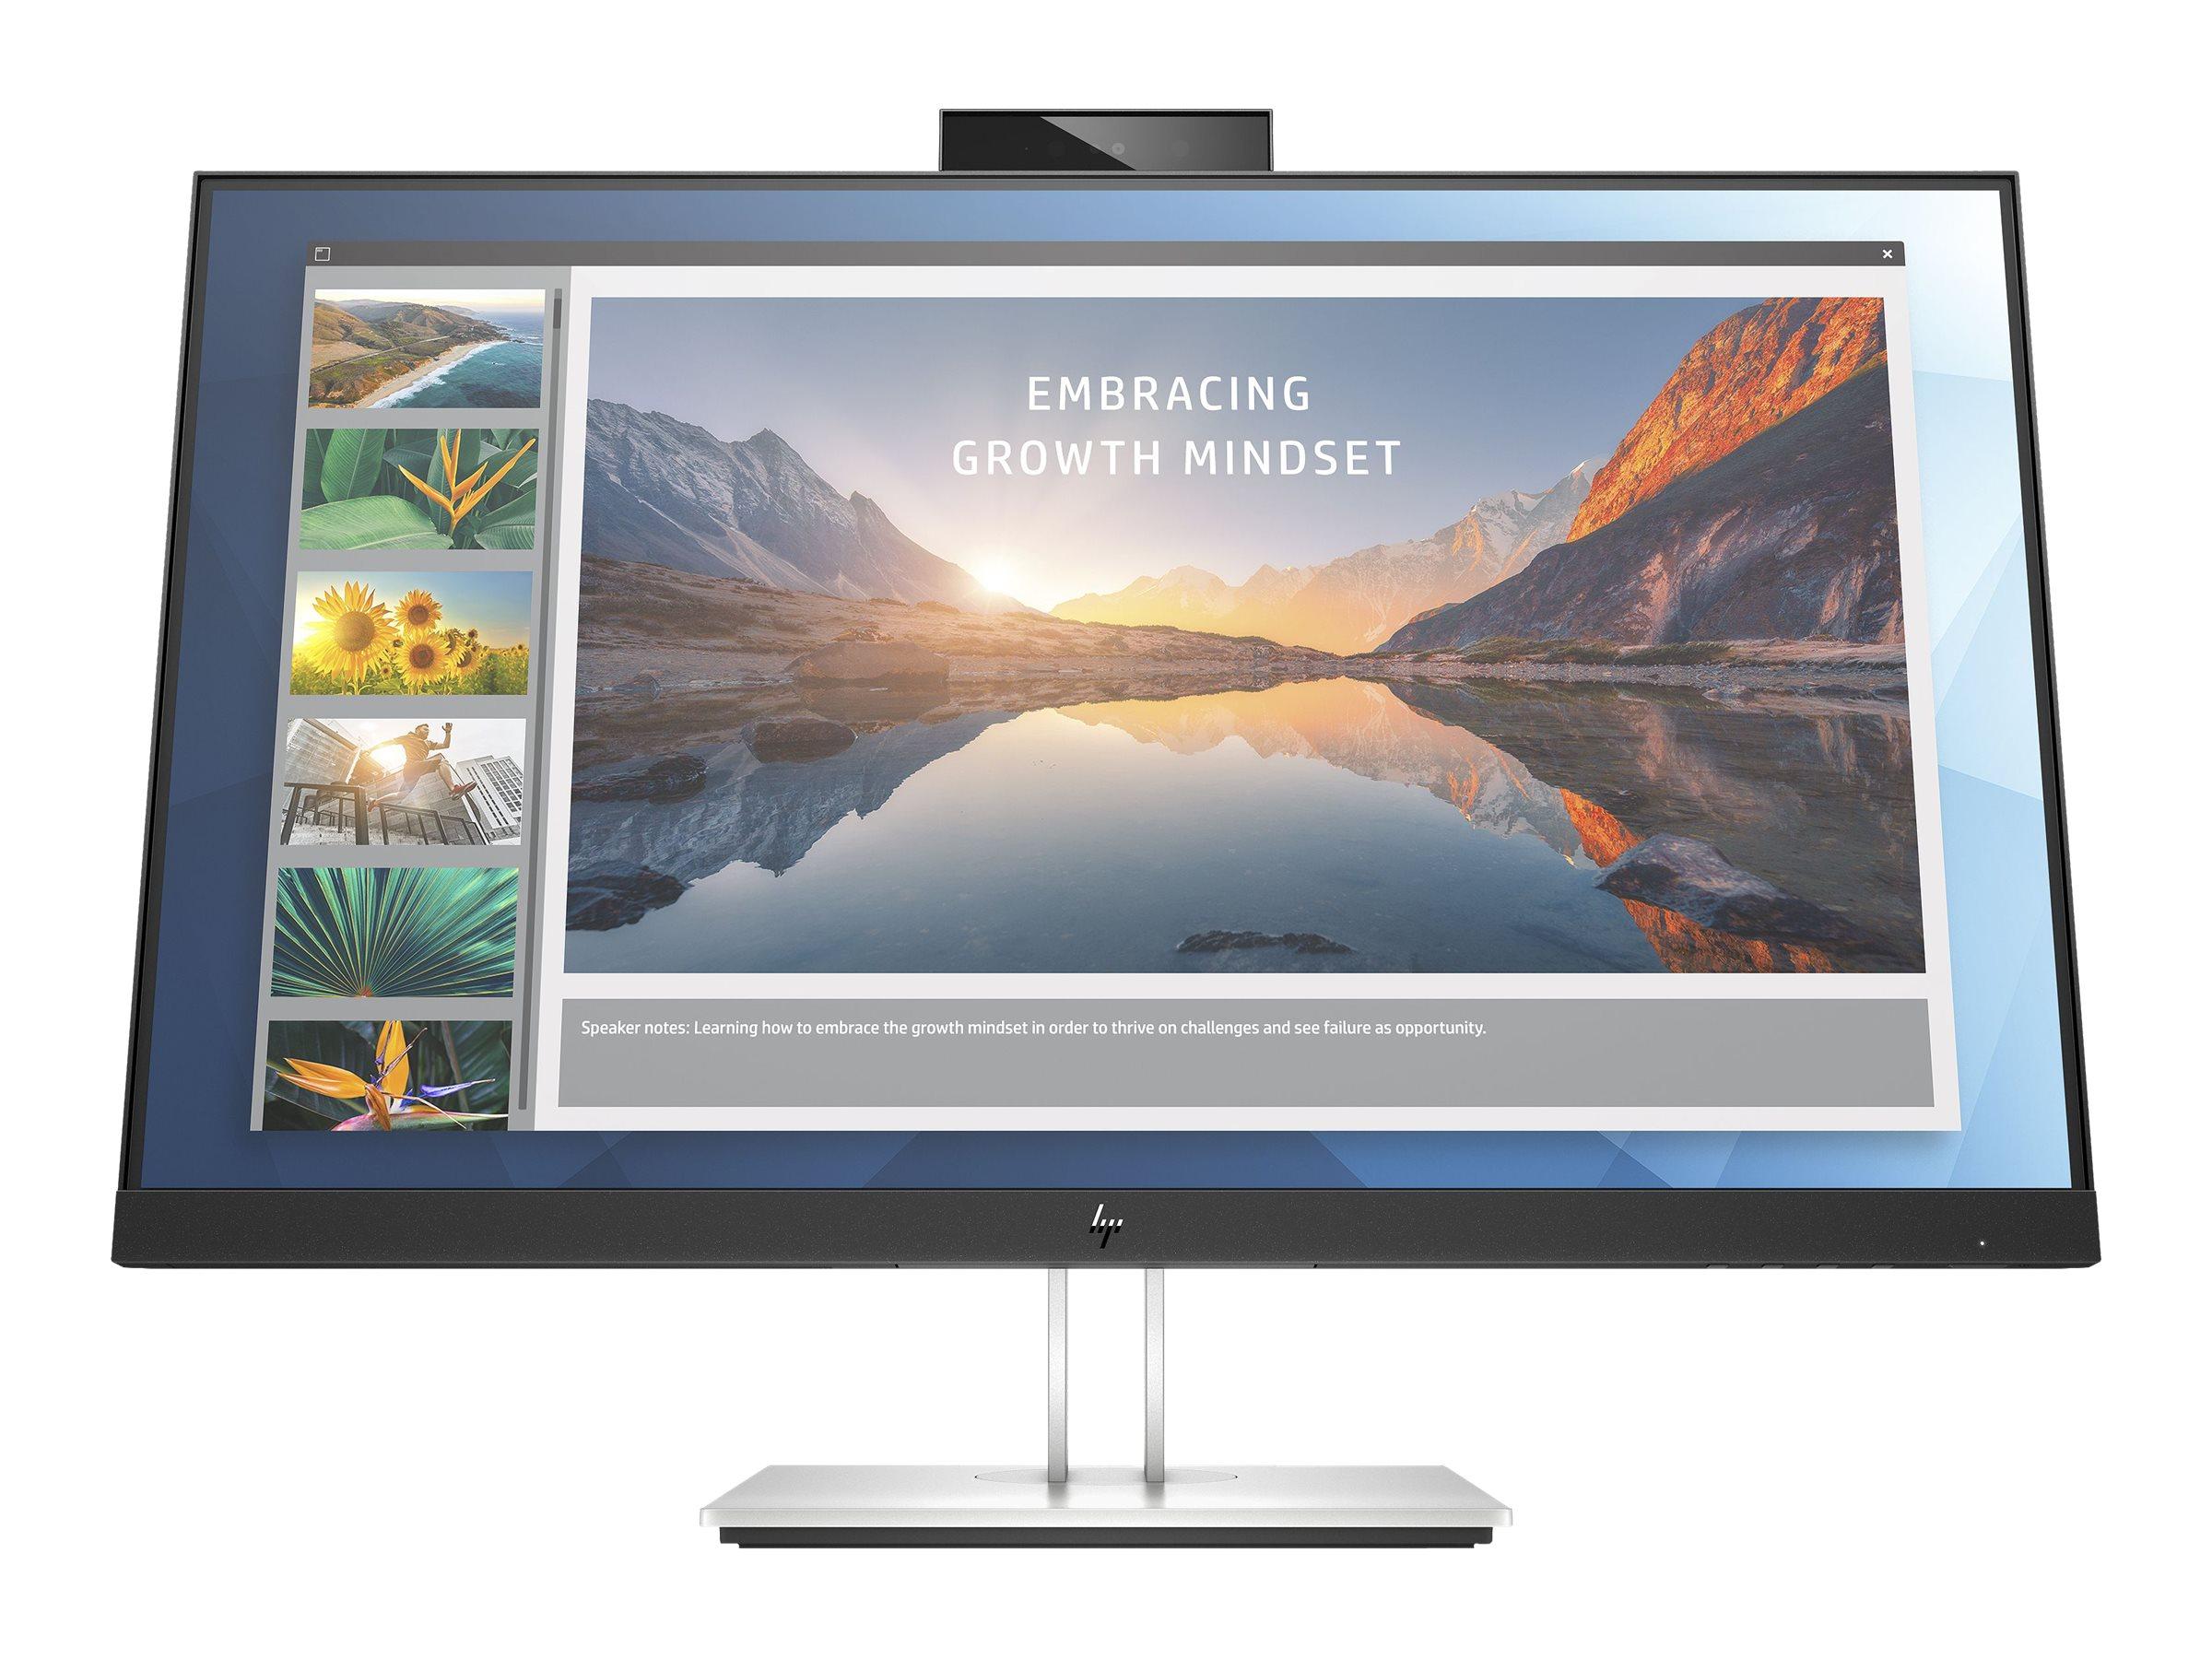 Hp e24d g4 advanced docking monitor led monitor 60 5 cm 23 8 23 8 sichtbar 1920 x 1080 full hd 1080p 60 hz ips 250 cd m 12365116 6pa50aa abb